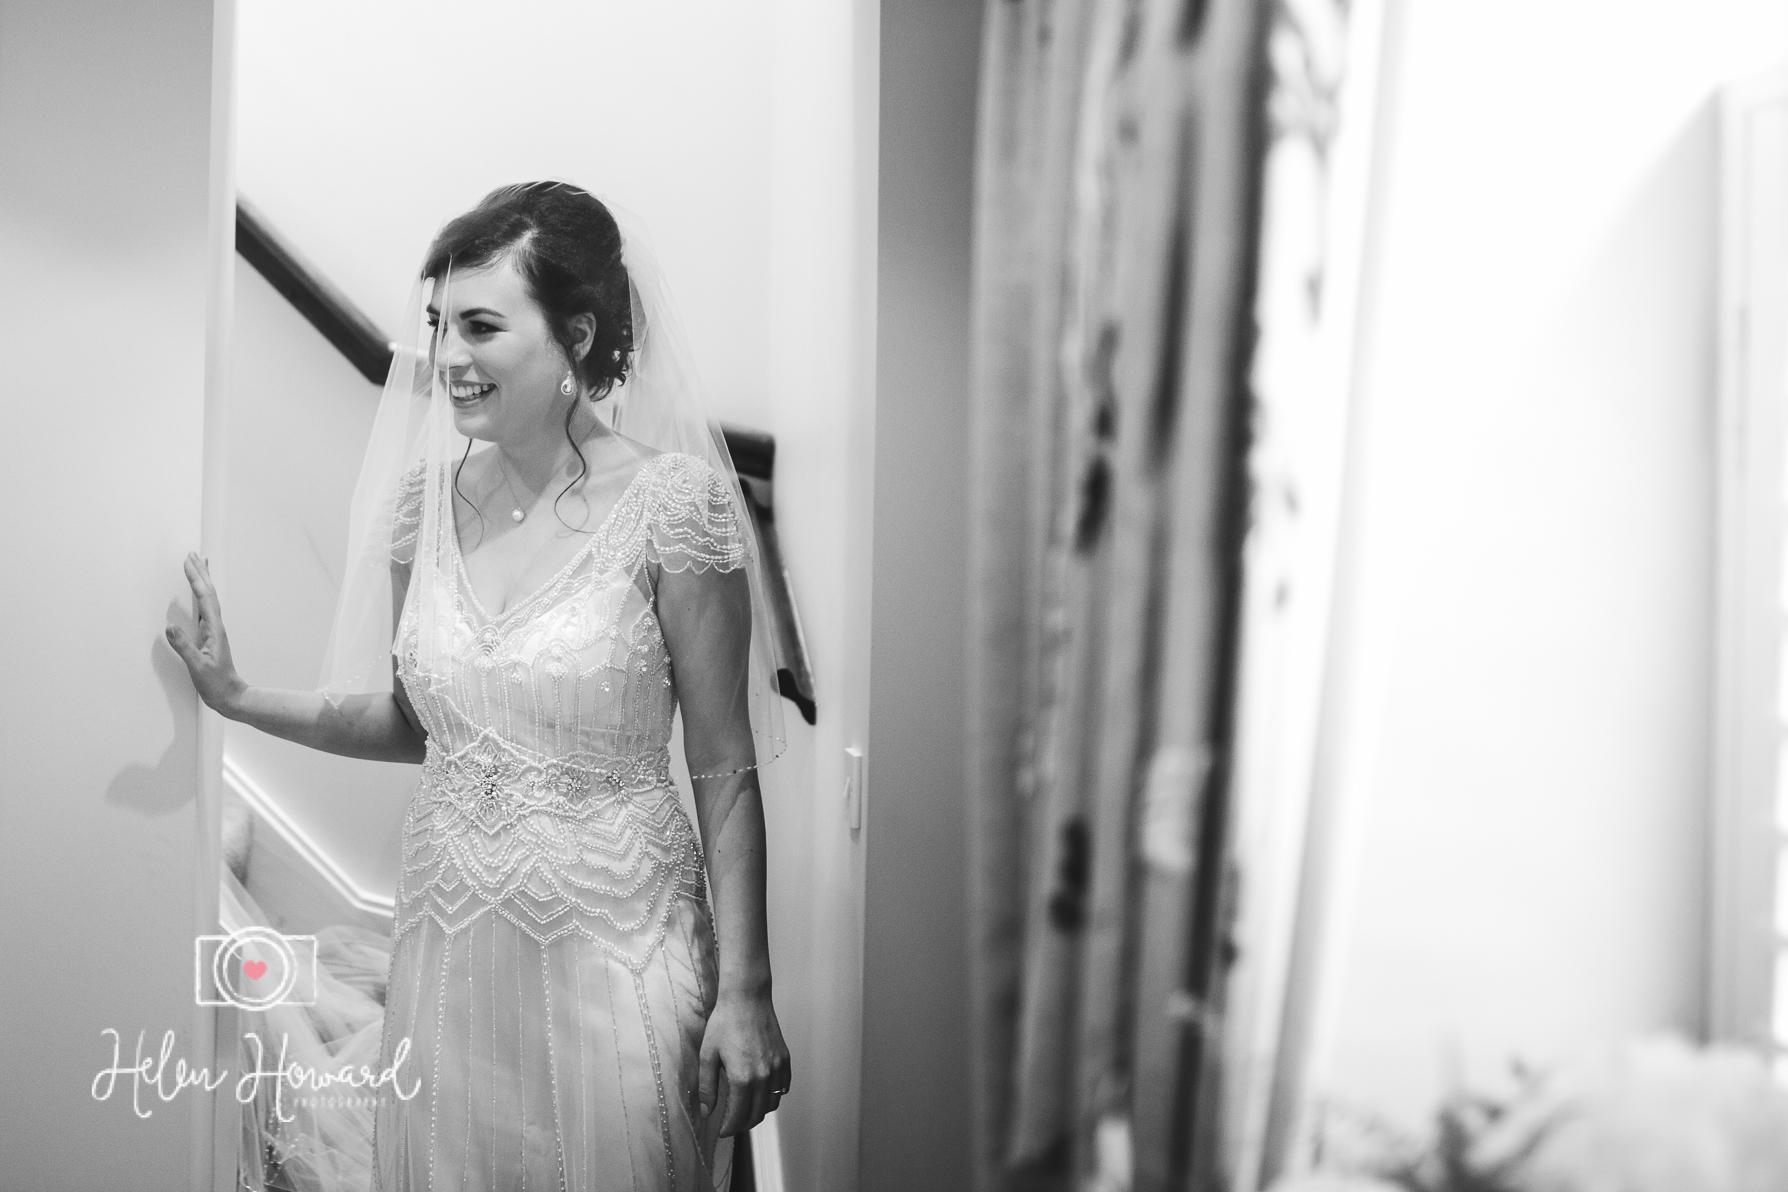 Helen Howard Photography Packington Moor Wedding-50.jpg